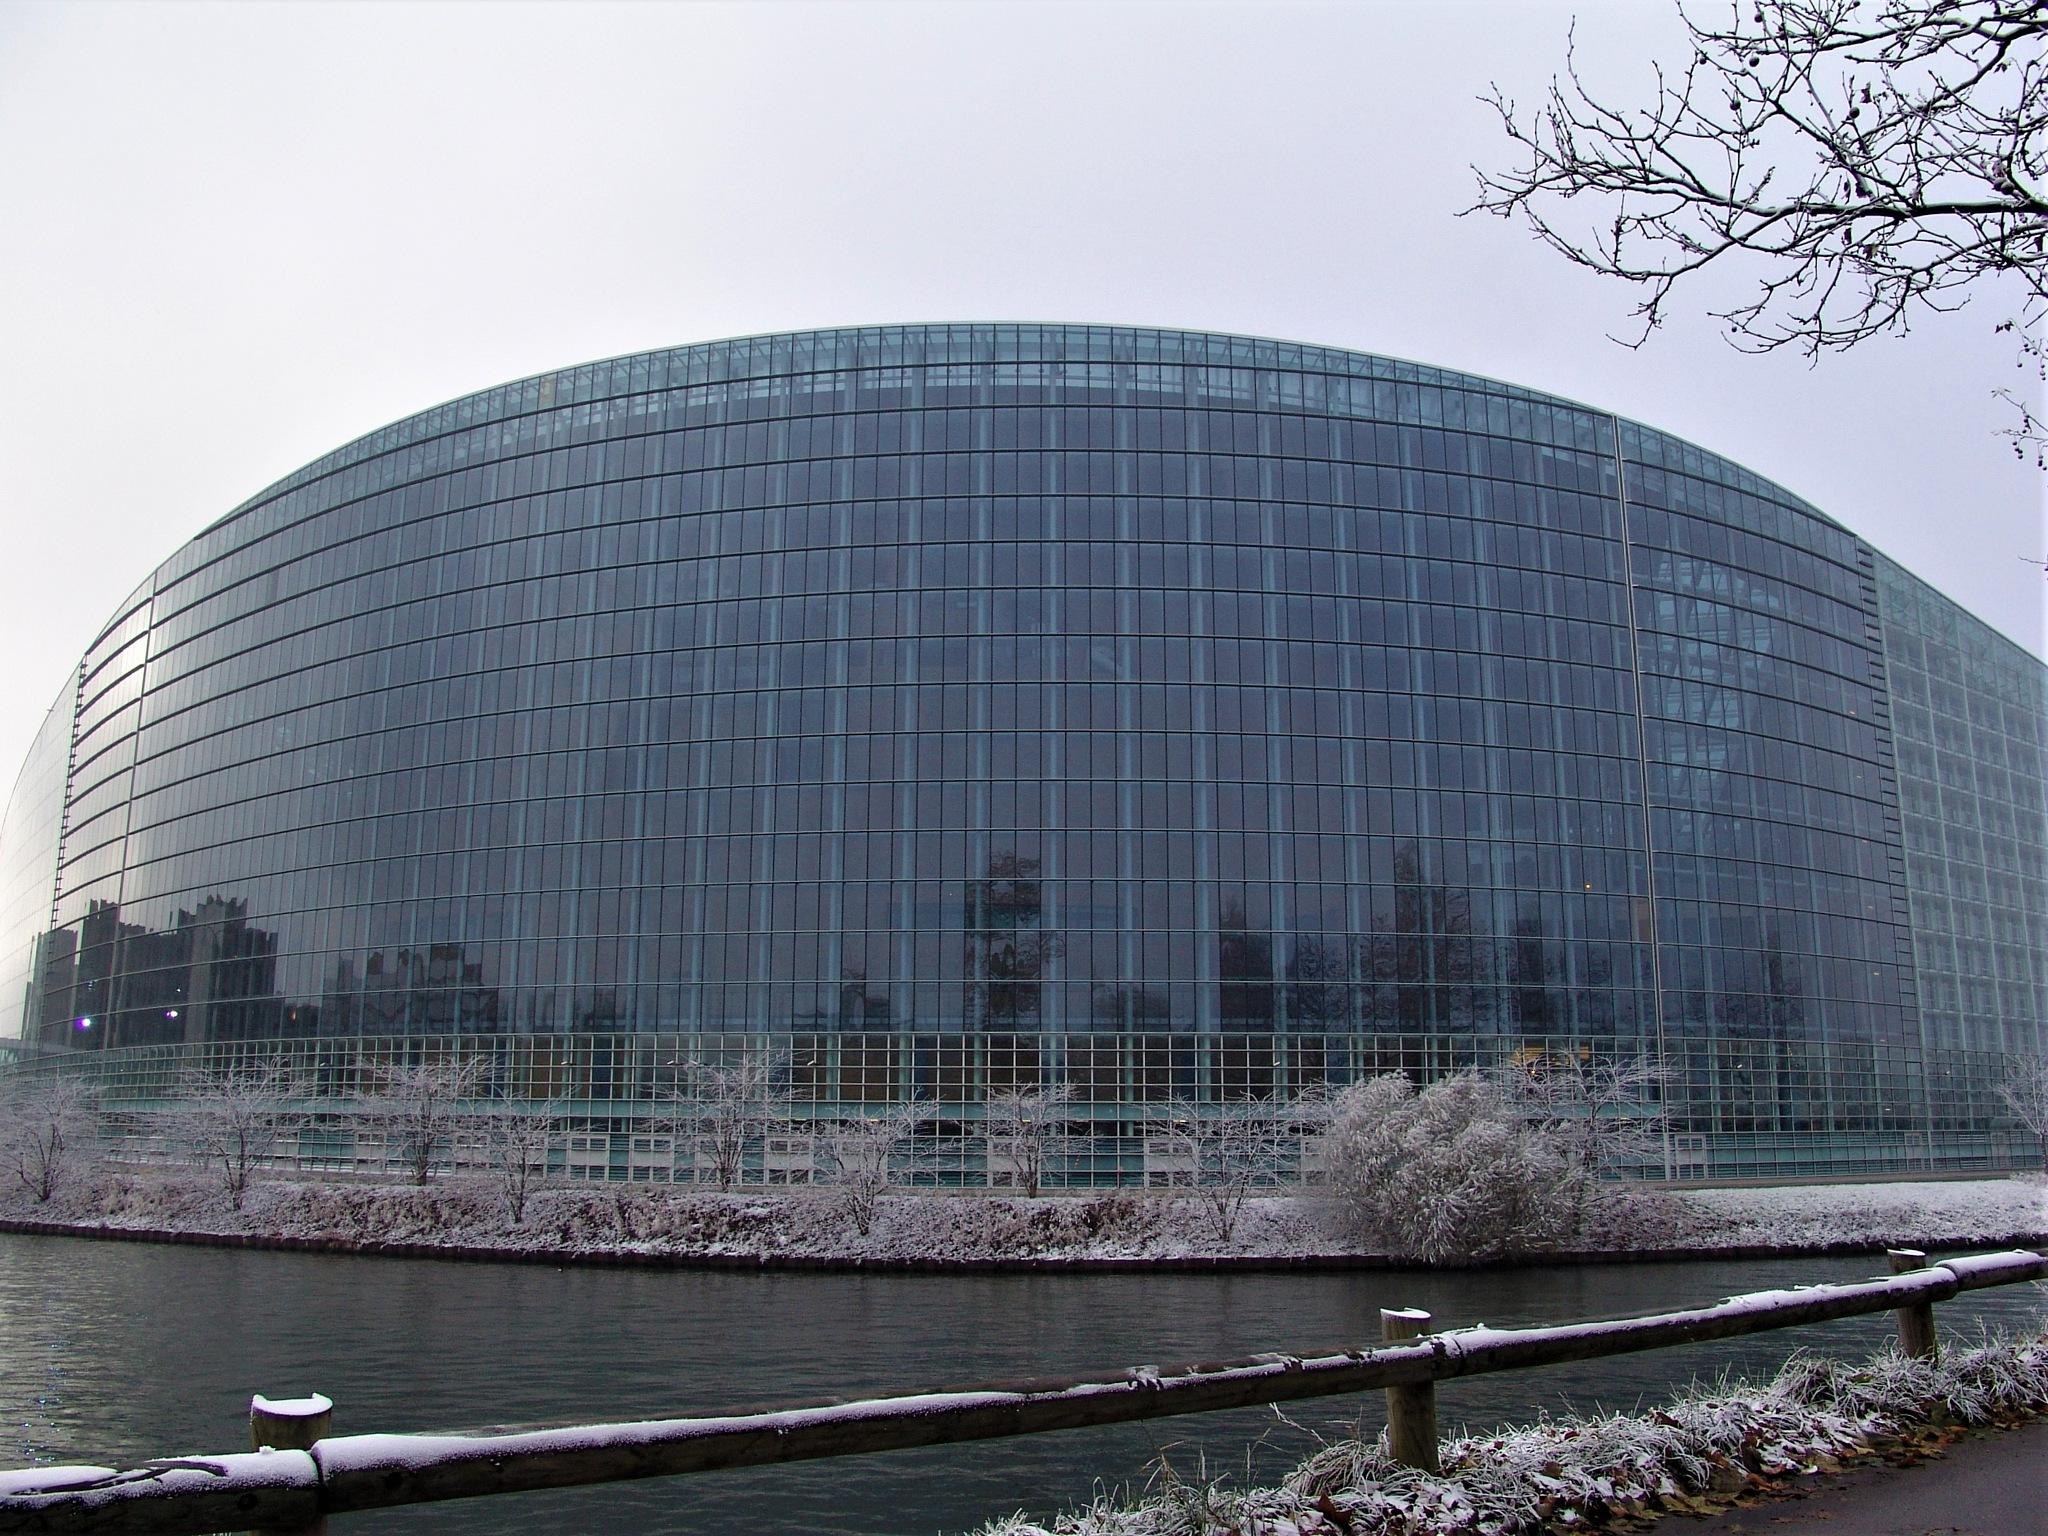 Strasbourg 04 by Murat Erkman